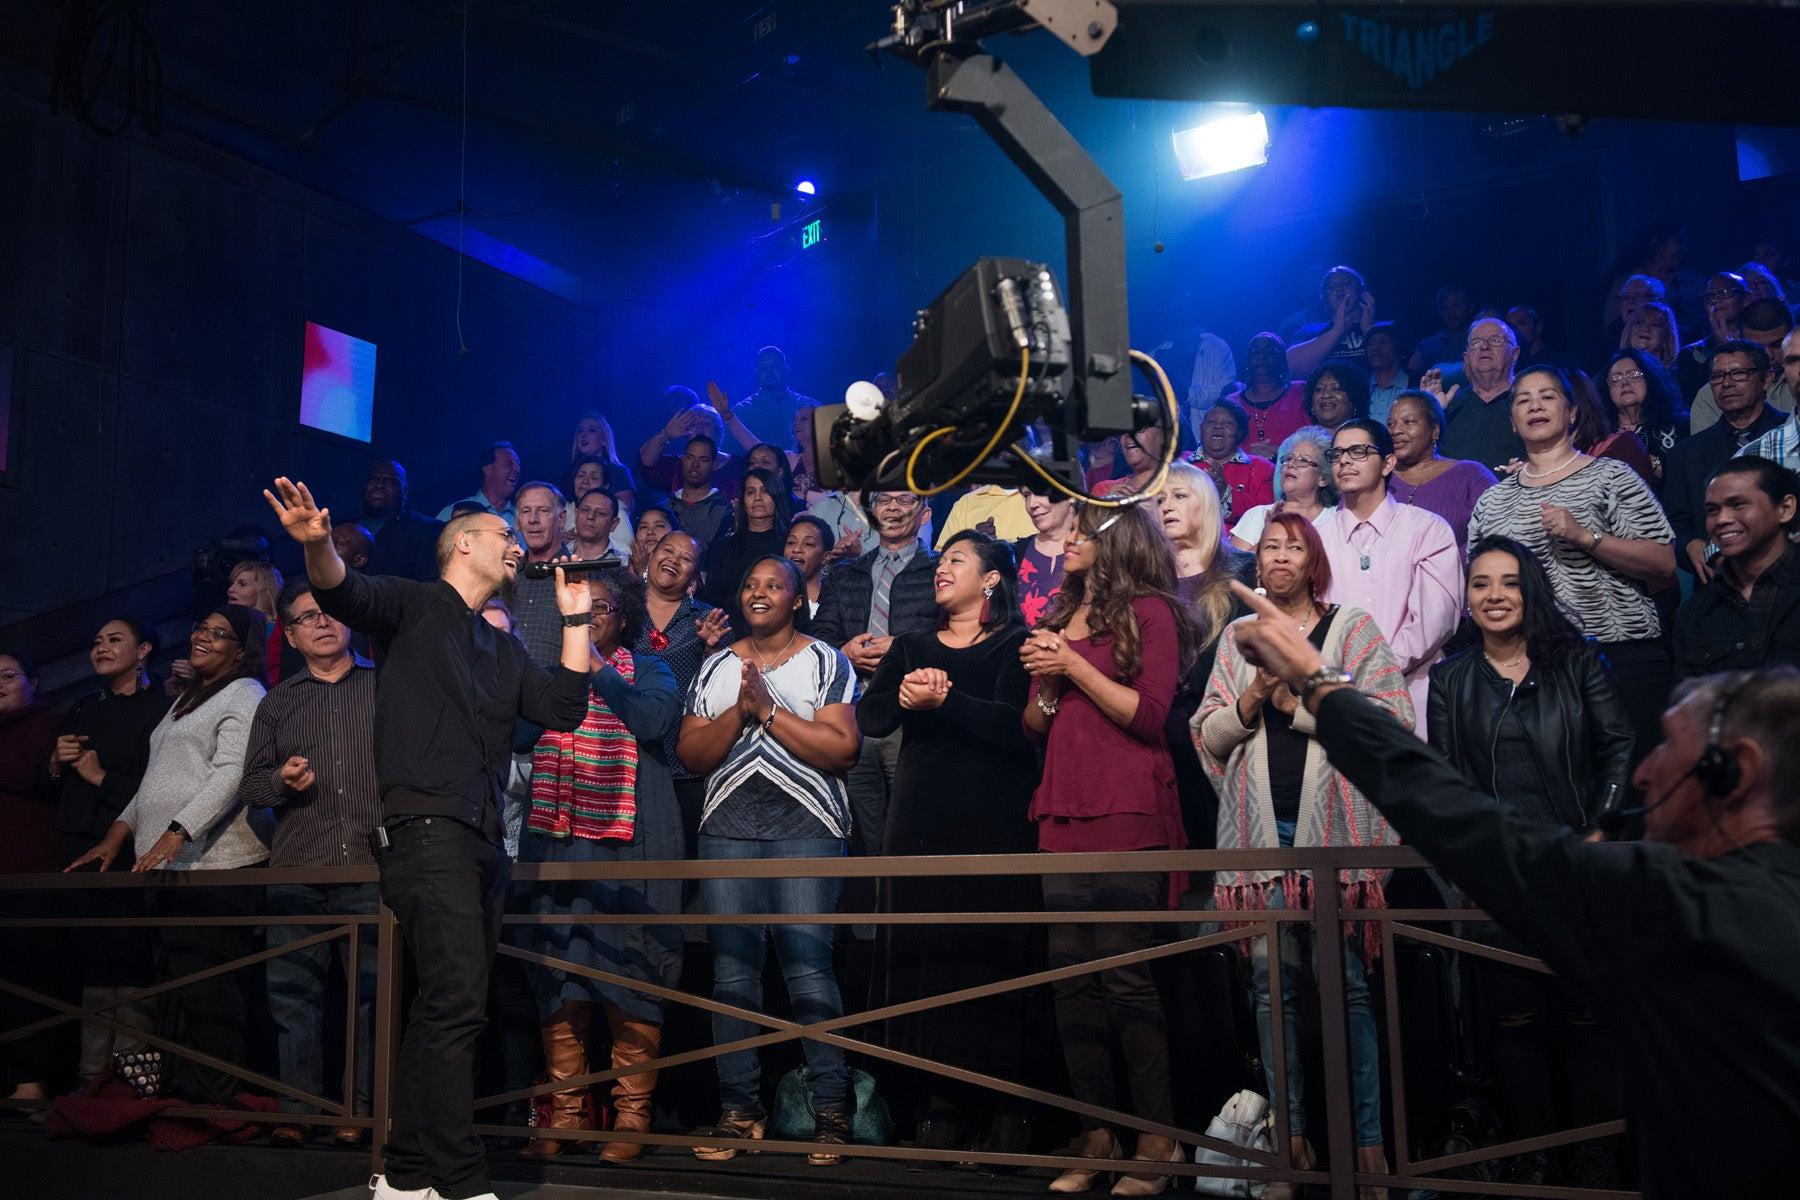 Praise Audience